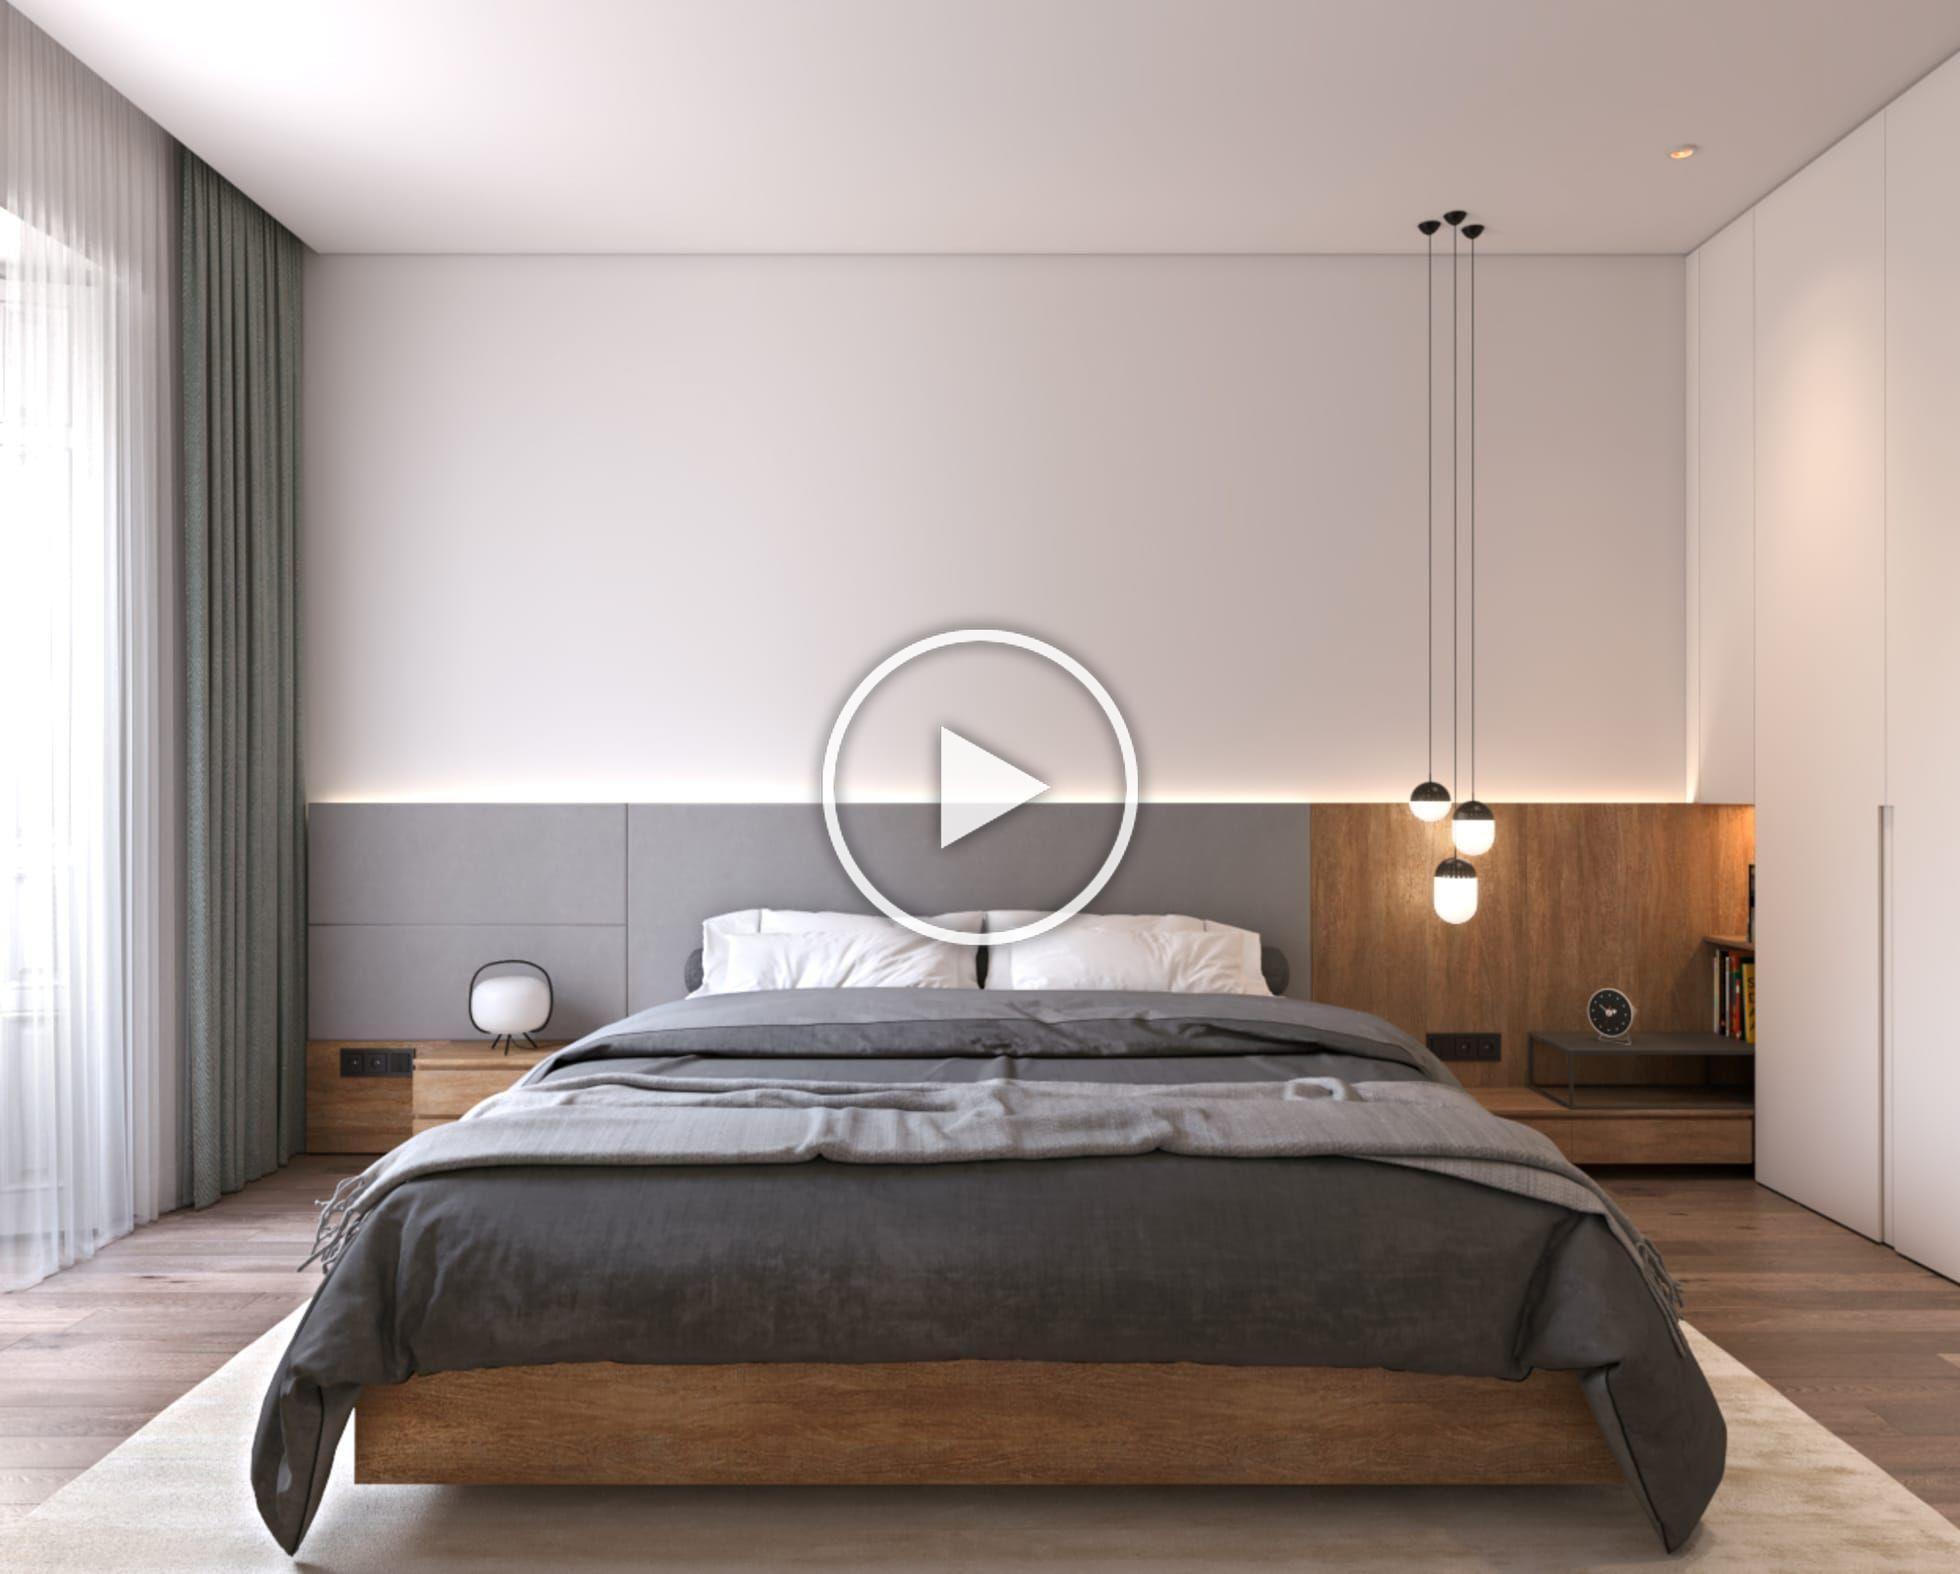 Pin By Minh Khanh On Interior Design Bedroom Hotel Bedroom Design Bedroom Bed Design Modern Bedroom Interior